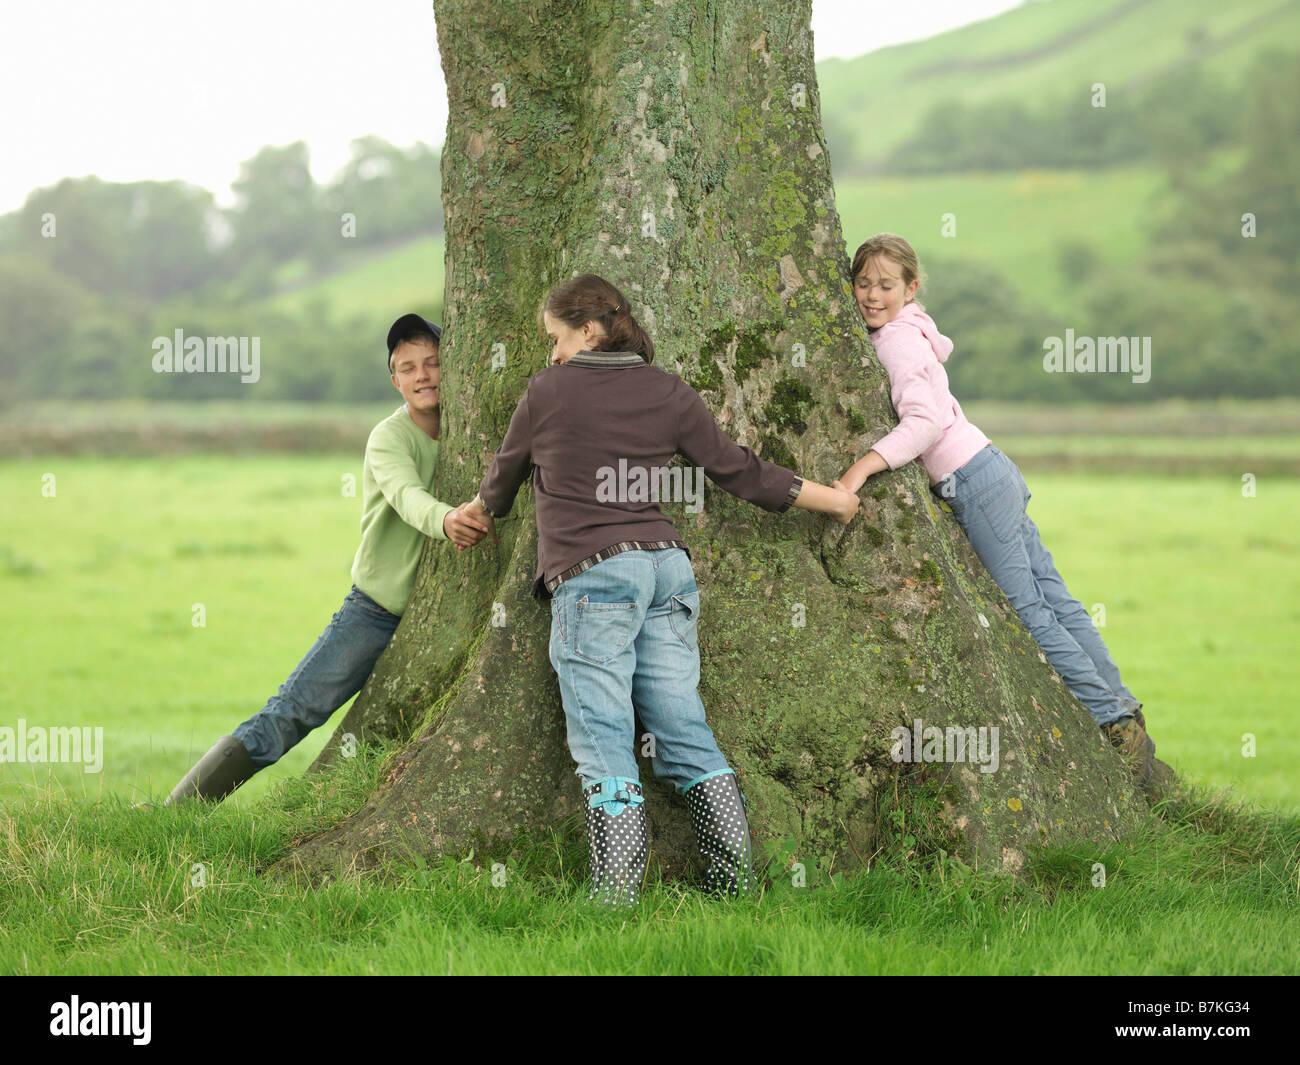 Children Hugging Tree - Stock Image